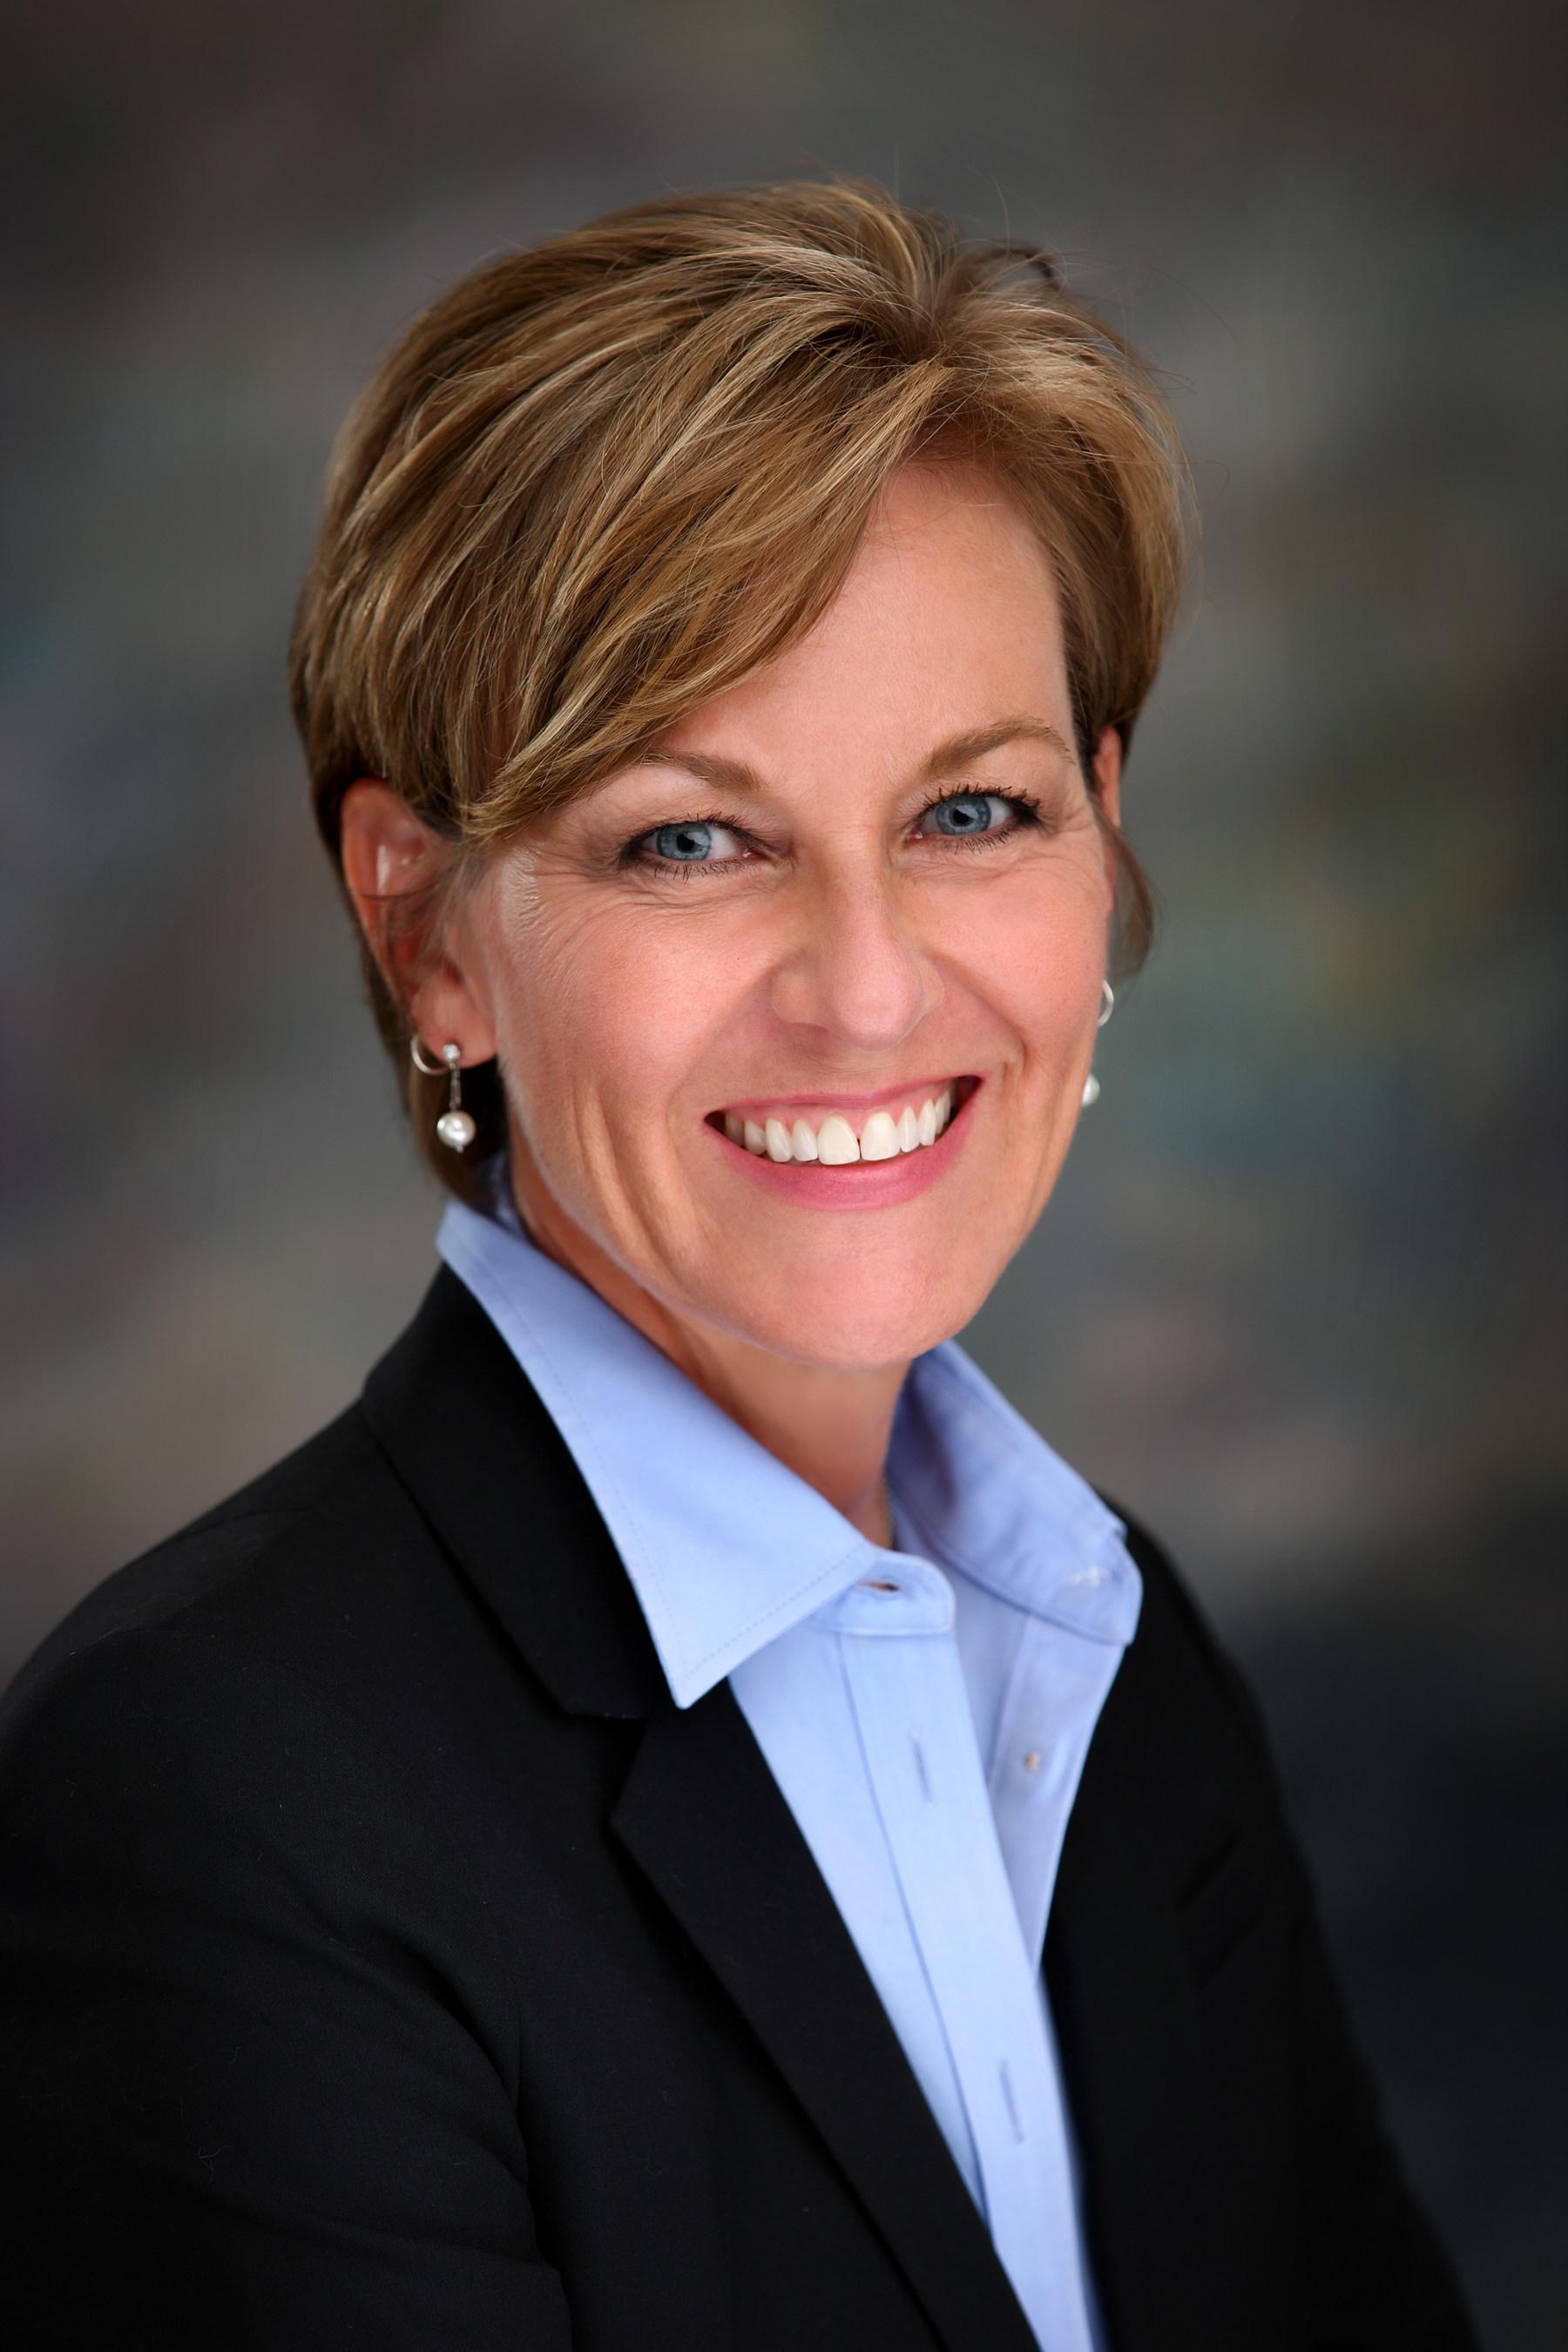 Kaycie Berley, Southwest Director of Production, NSM Insurance Group